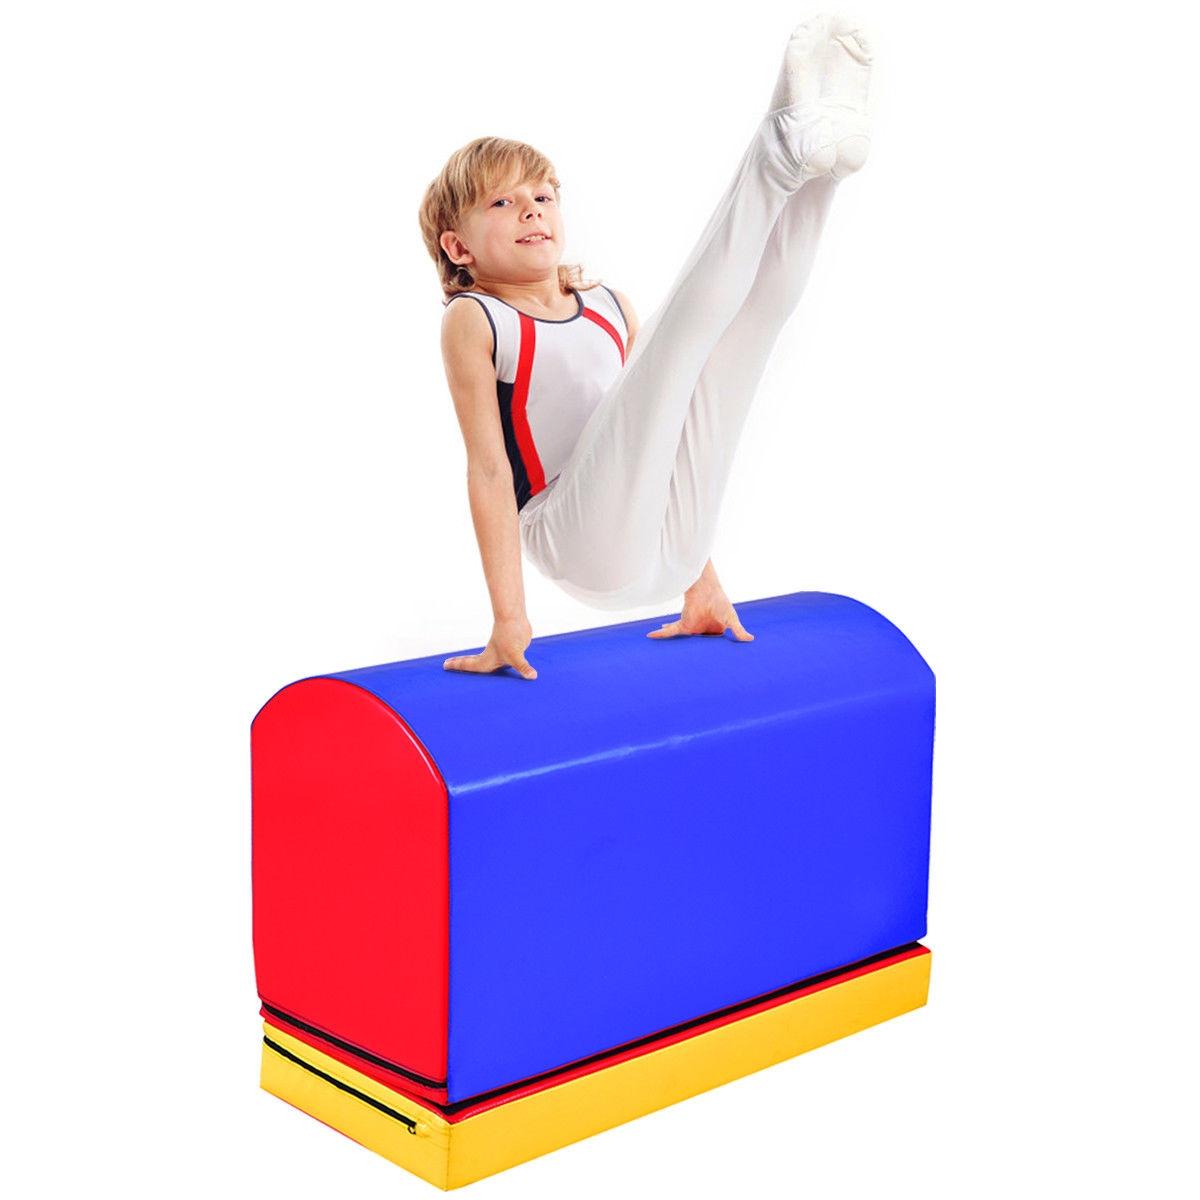 Goplus Mailbox Trainer Tumbling Aid Gymnastics Jumping Box Heightening Mat